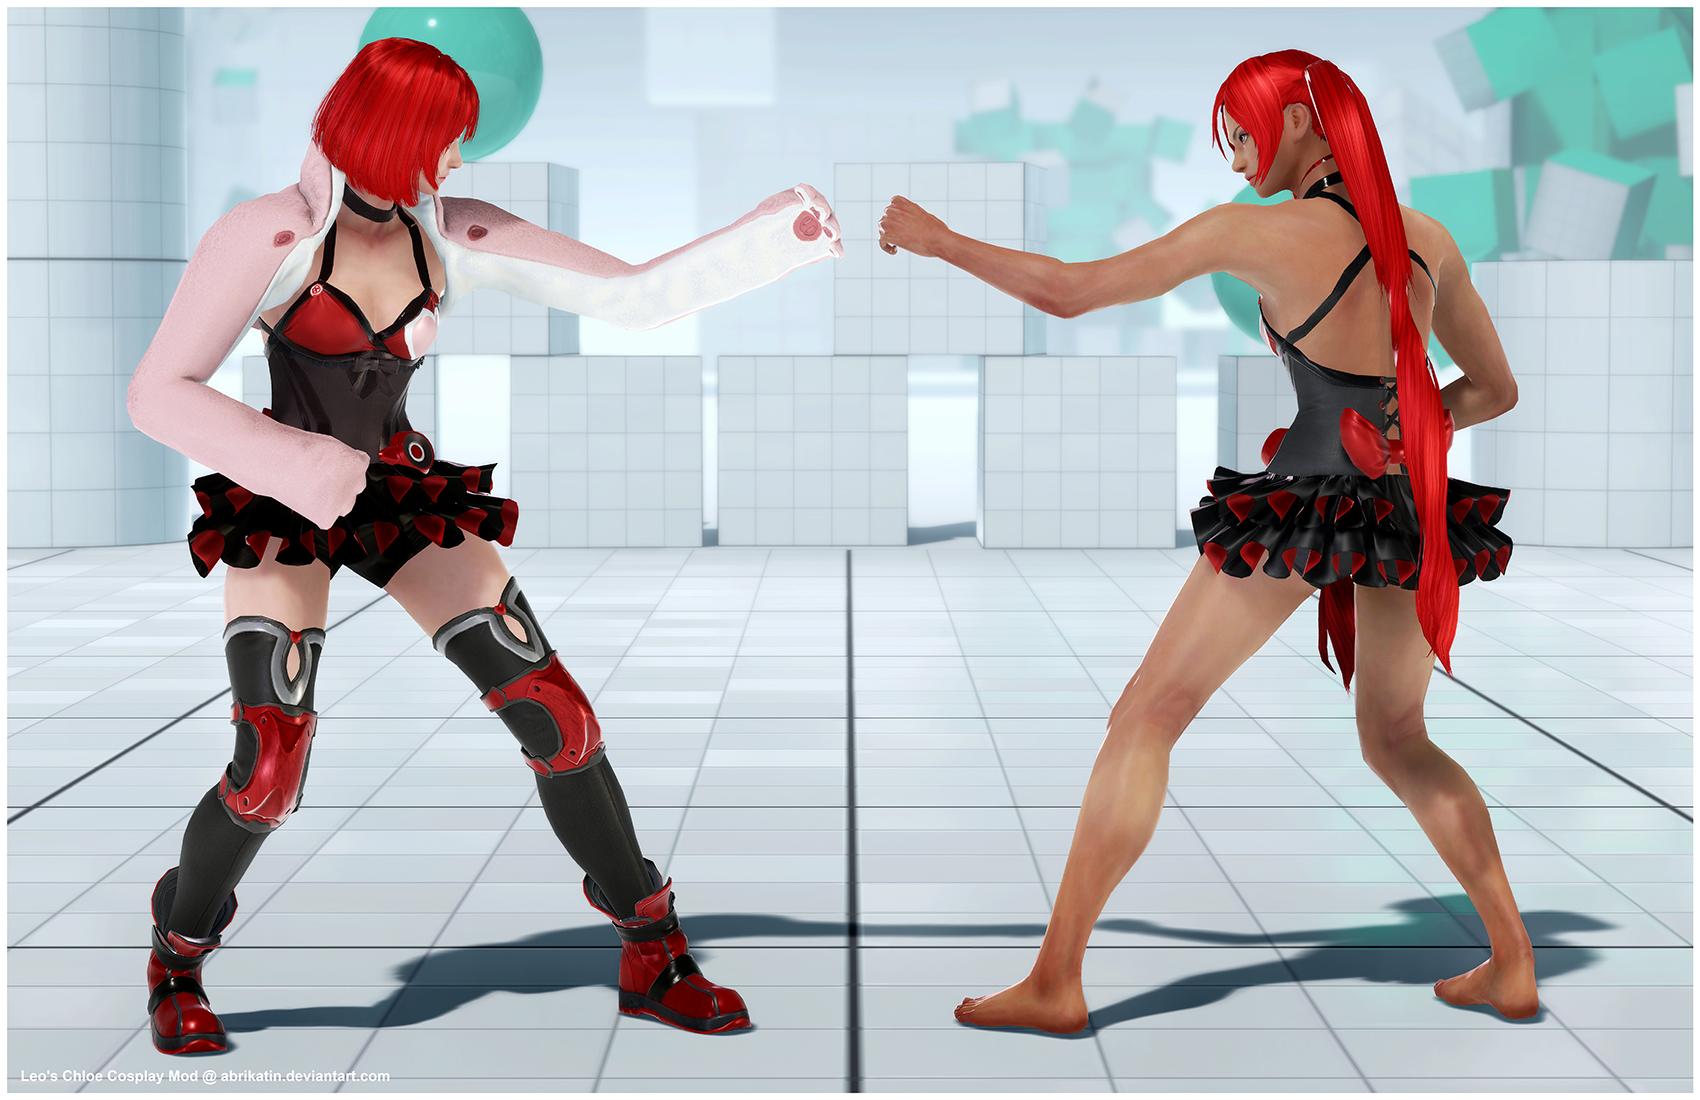 Leo's Chloe Cosplay [Tekken 7 PC mod] by Abrikatin